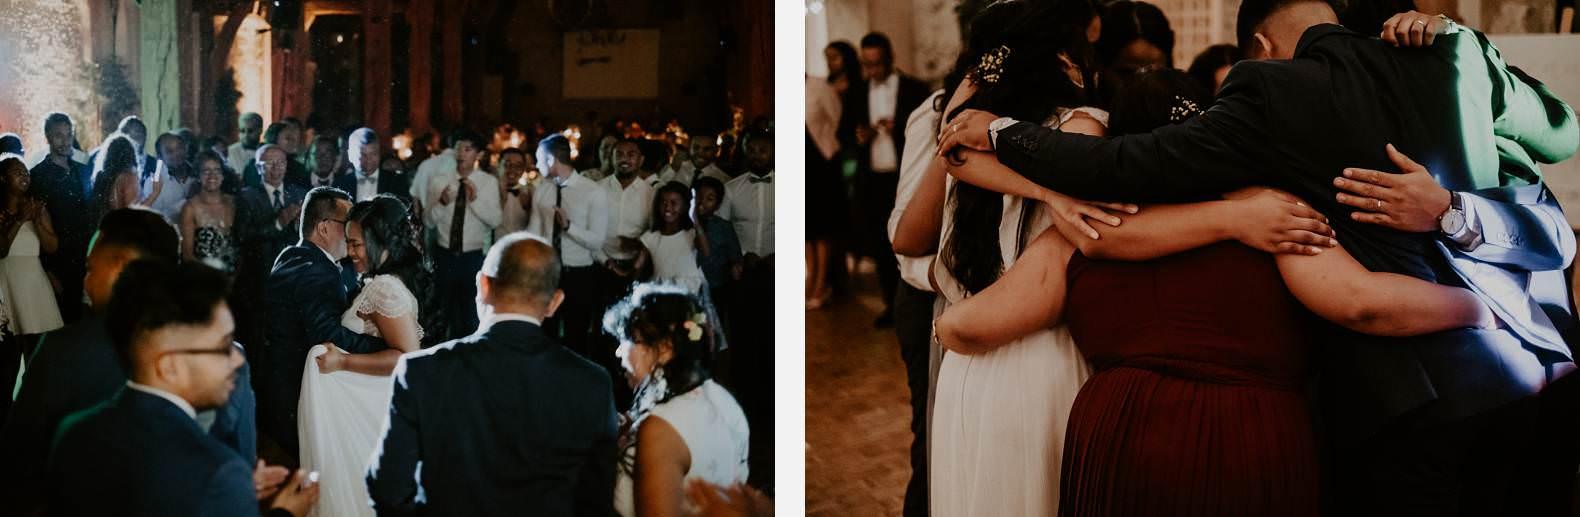 mariage manoir de corny photographe bel esprit 0072 1